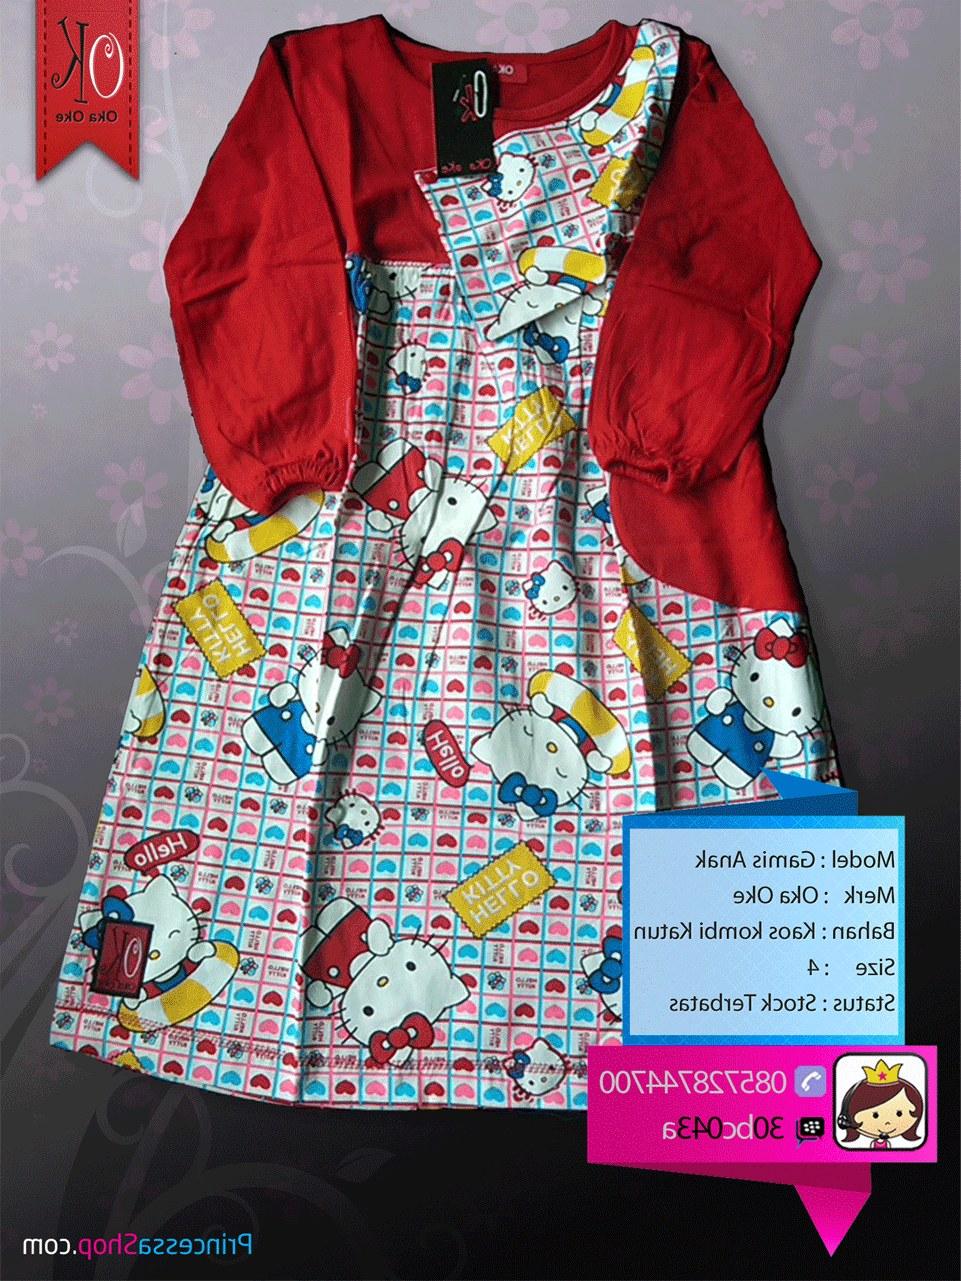 Ide Baju Lebaran Anak 2 Tahun Qwdq Novel Terbaru Alaf